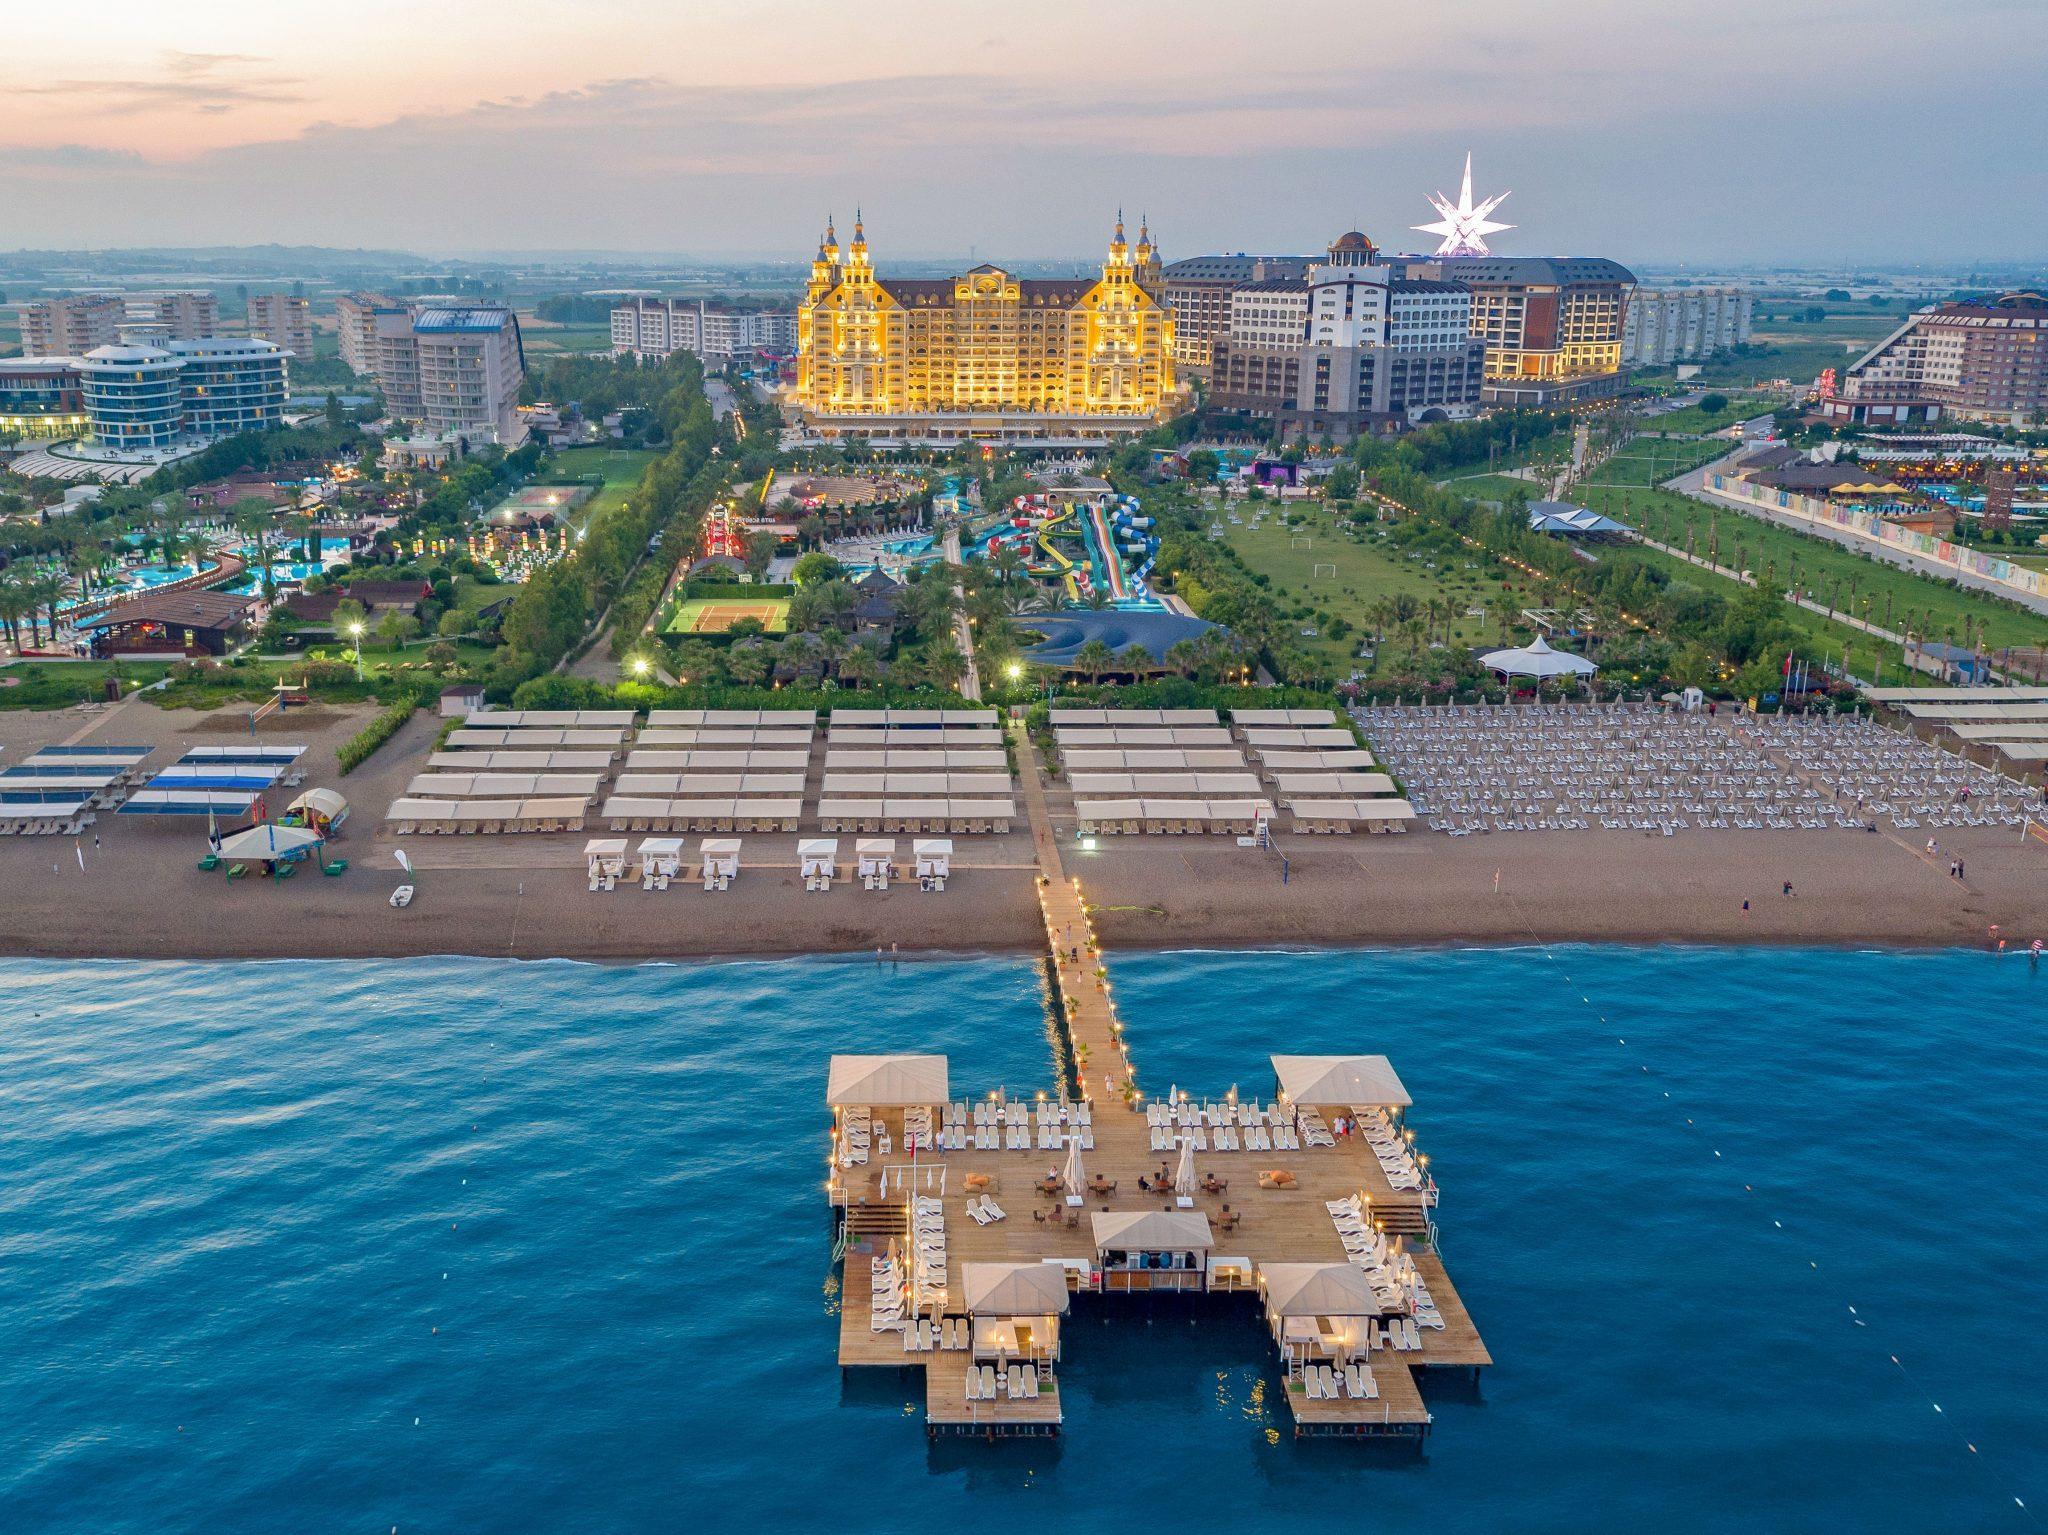 Letovanje_Turska_Hoteli_Avio_Antalija_Hotel_Royal_Holiday_Palace-12-scaled.jpg